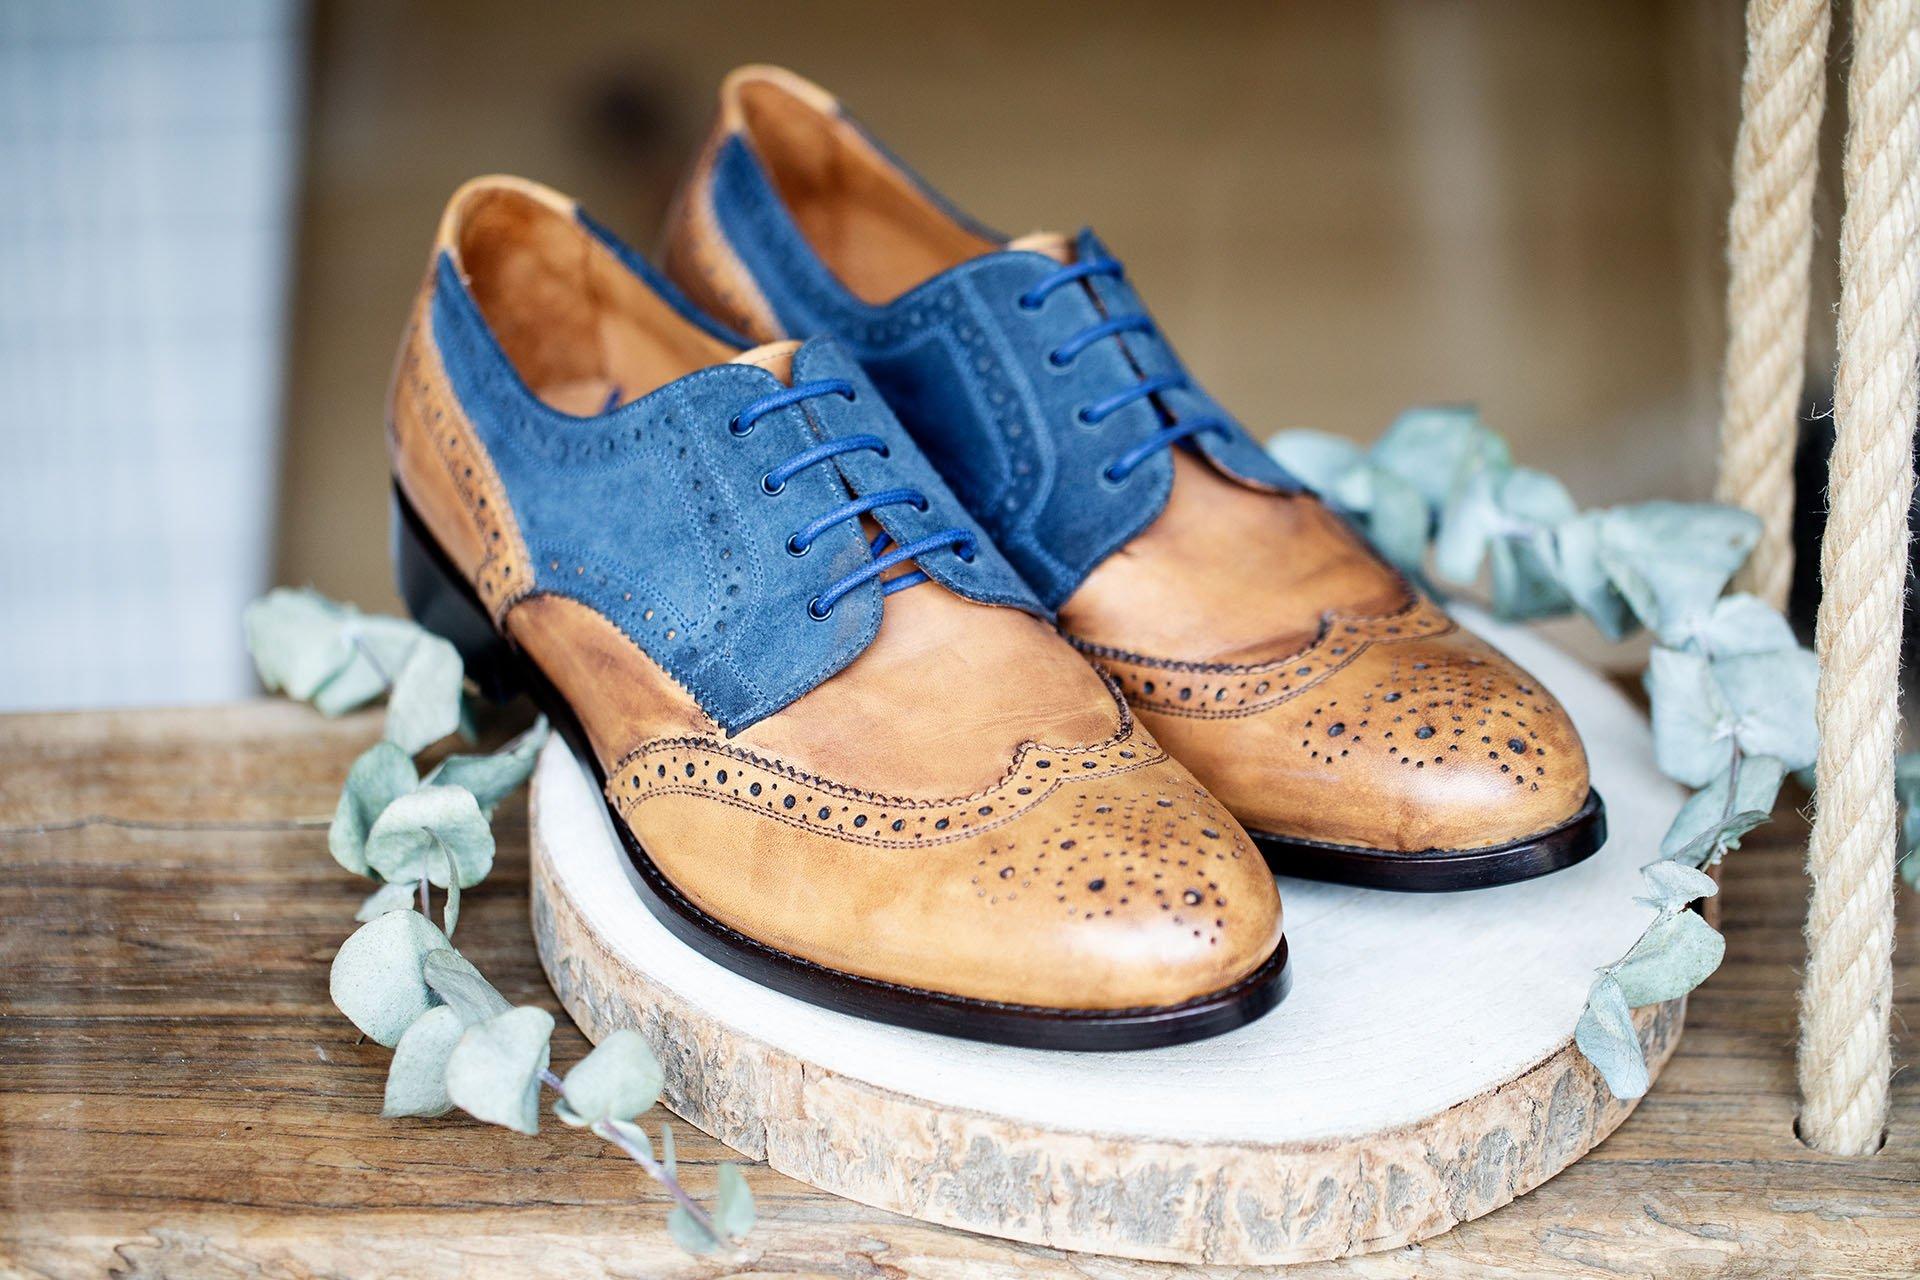 Franco Trio calzature artigianali